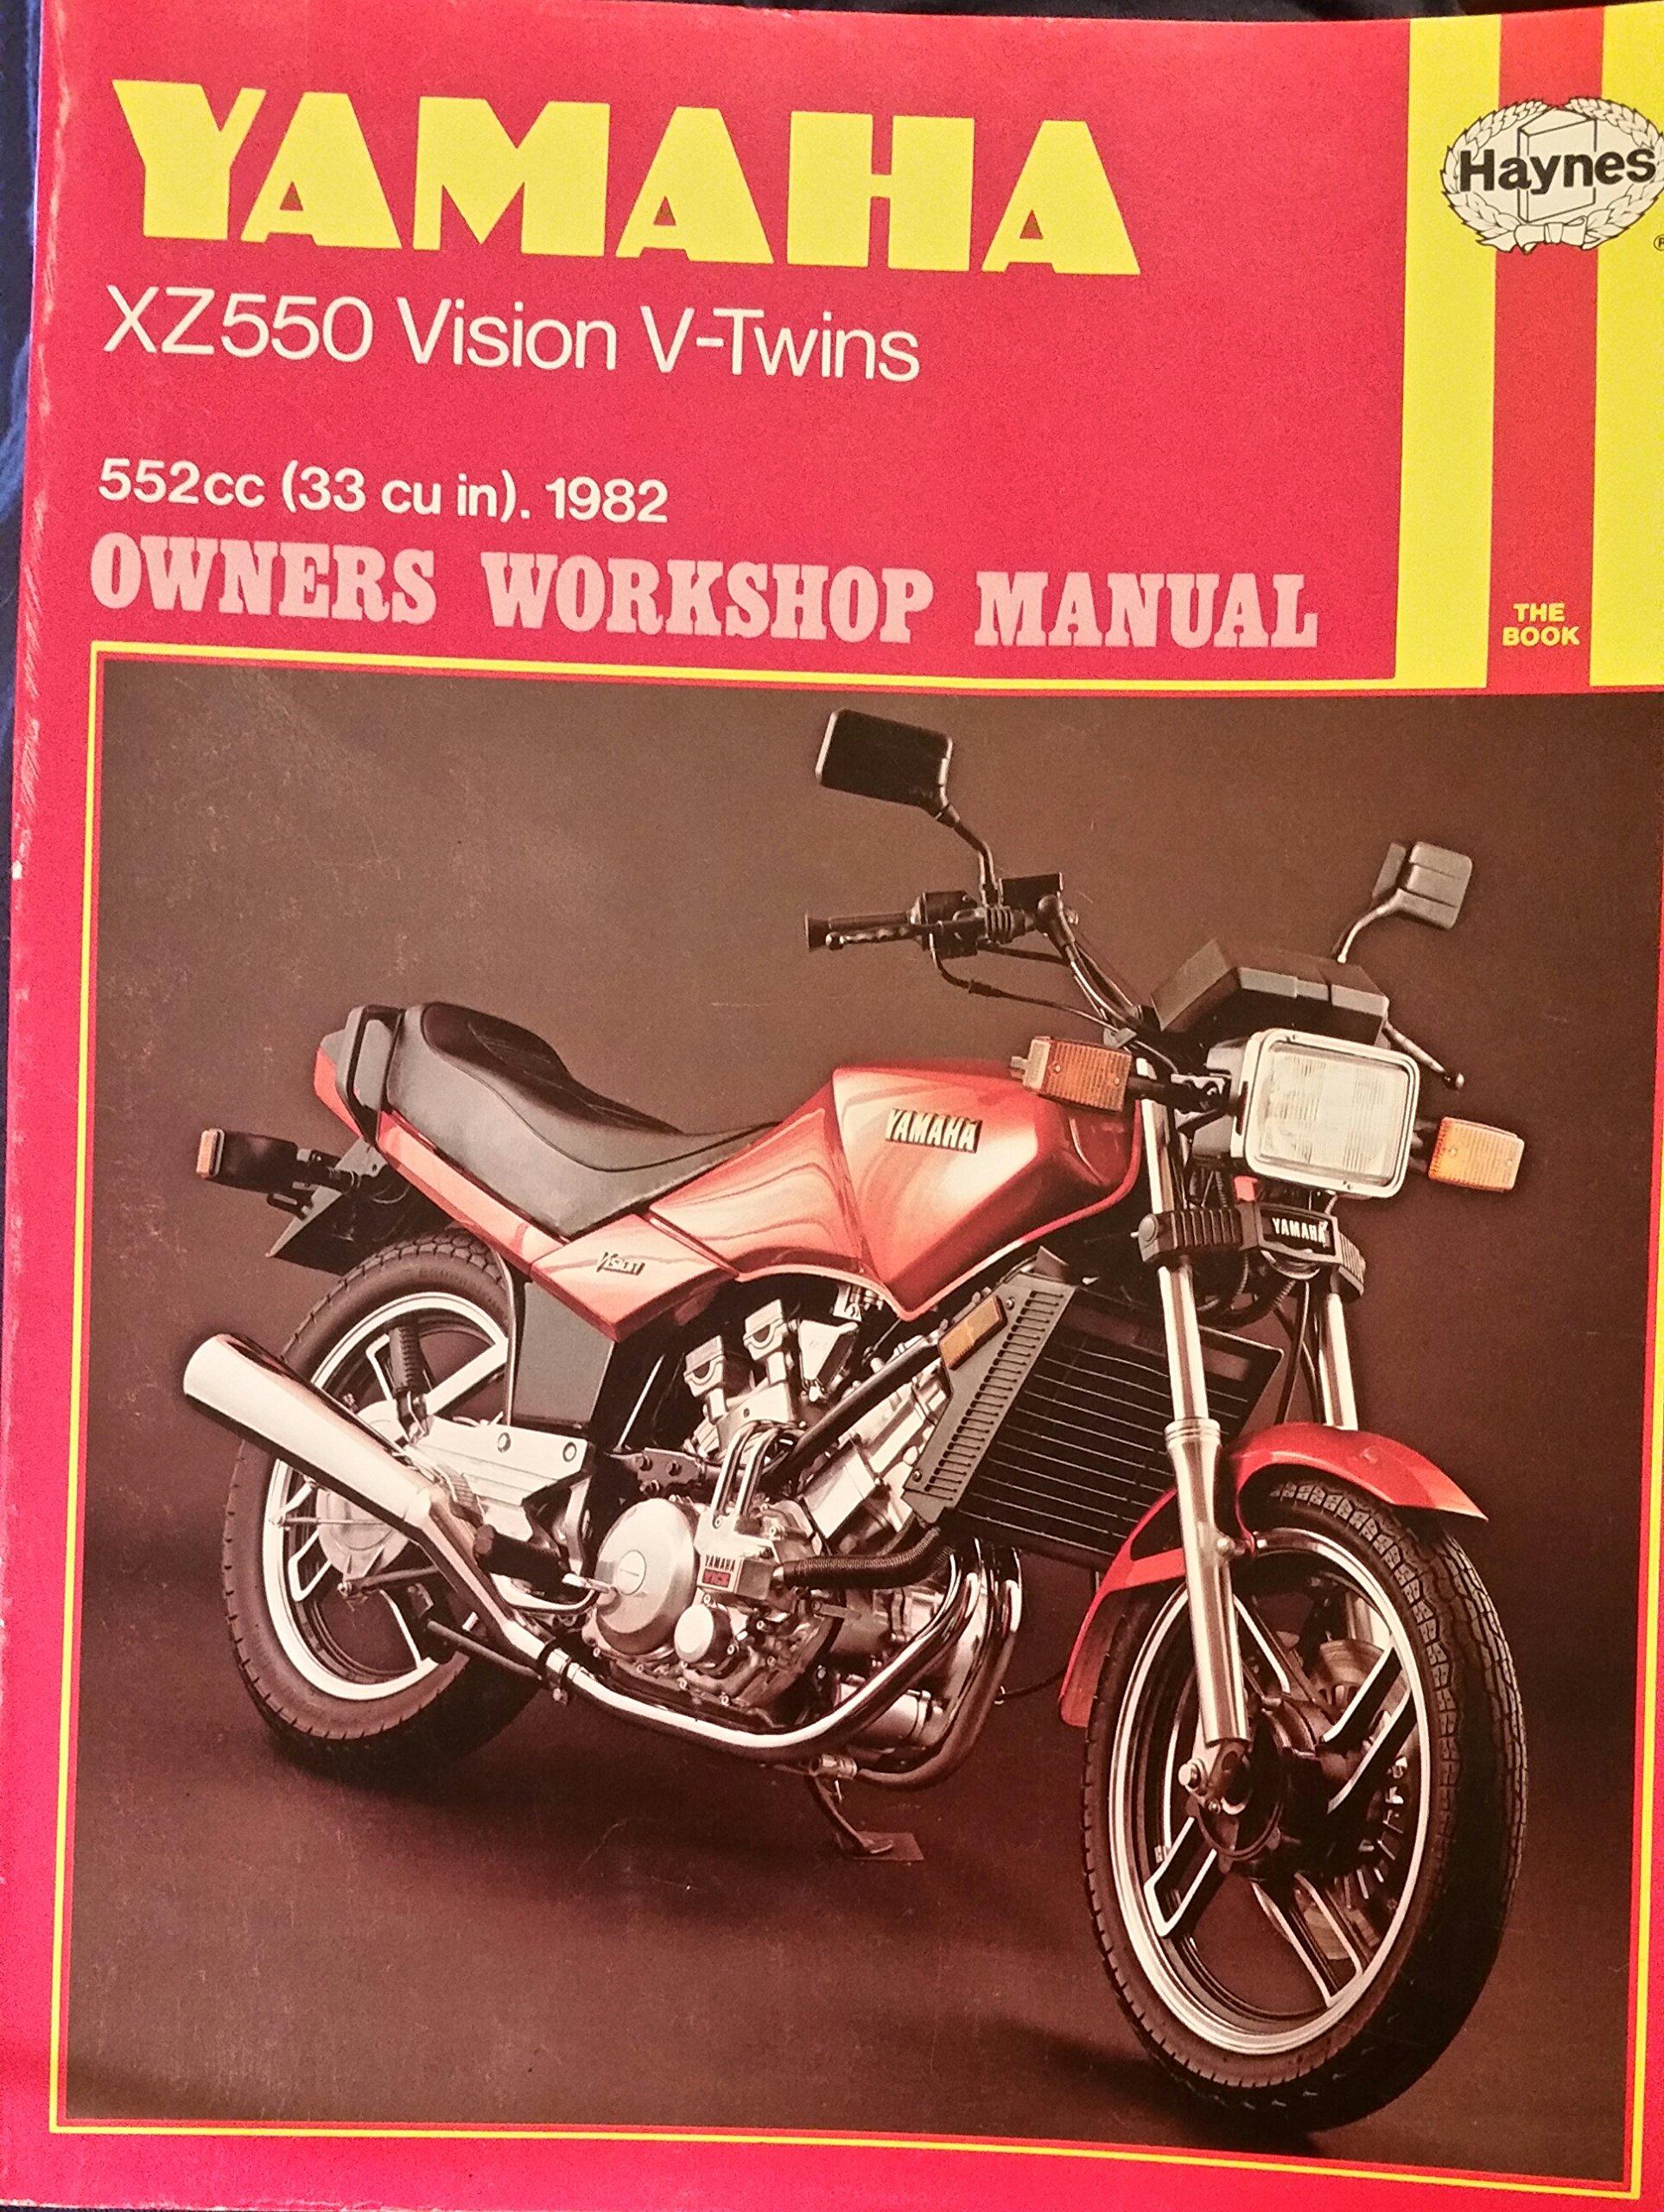 yamaha xz550 vision v twins owner s workshop manual curt choate rh amazon com 82 Yamaha Vision 550 Yamaha Vision Parts